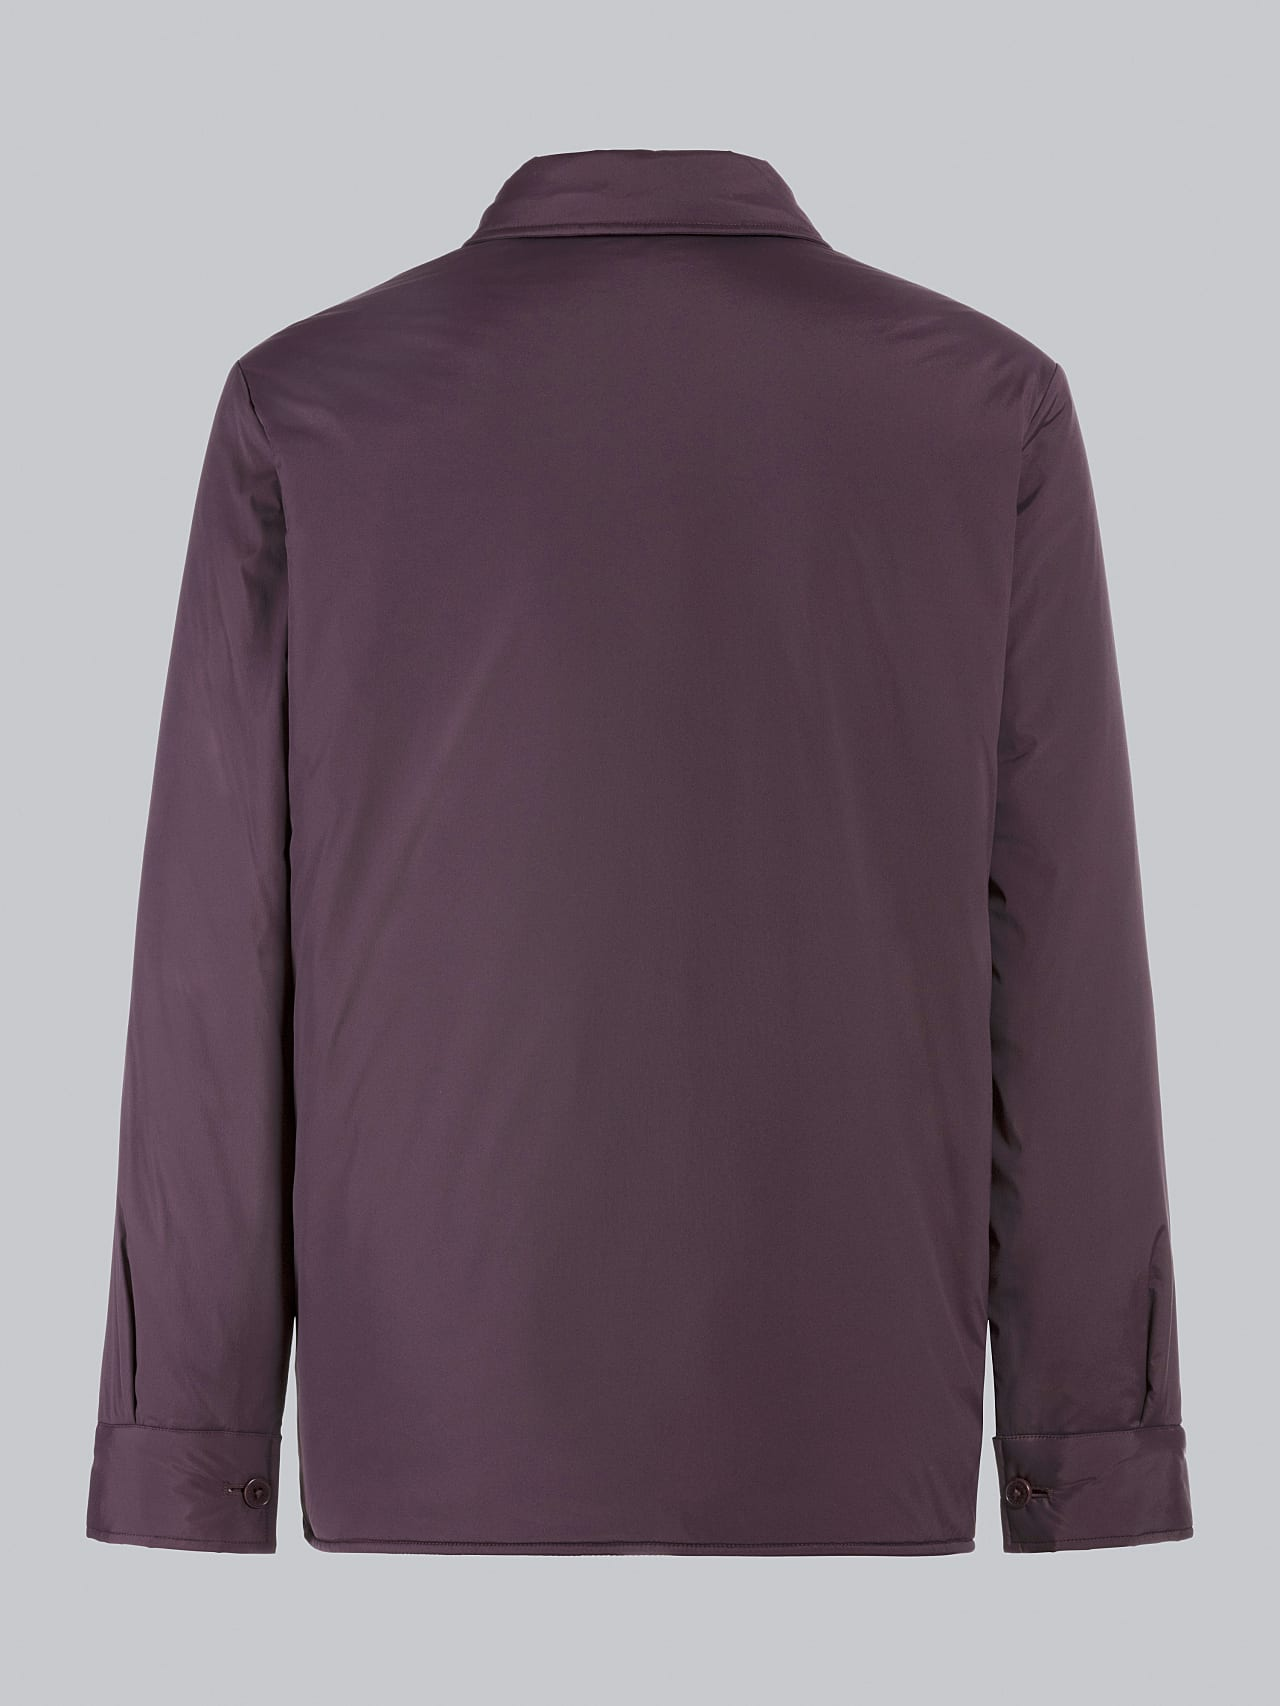 OSHEN V1.Y5.02 PrimaLoft® Overshirt Jacket Burgundy Left Alpha Tauri